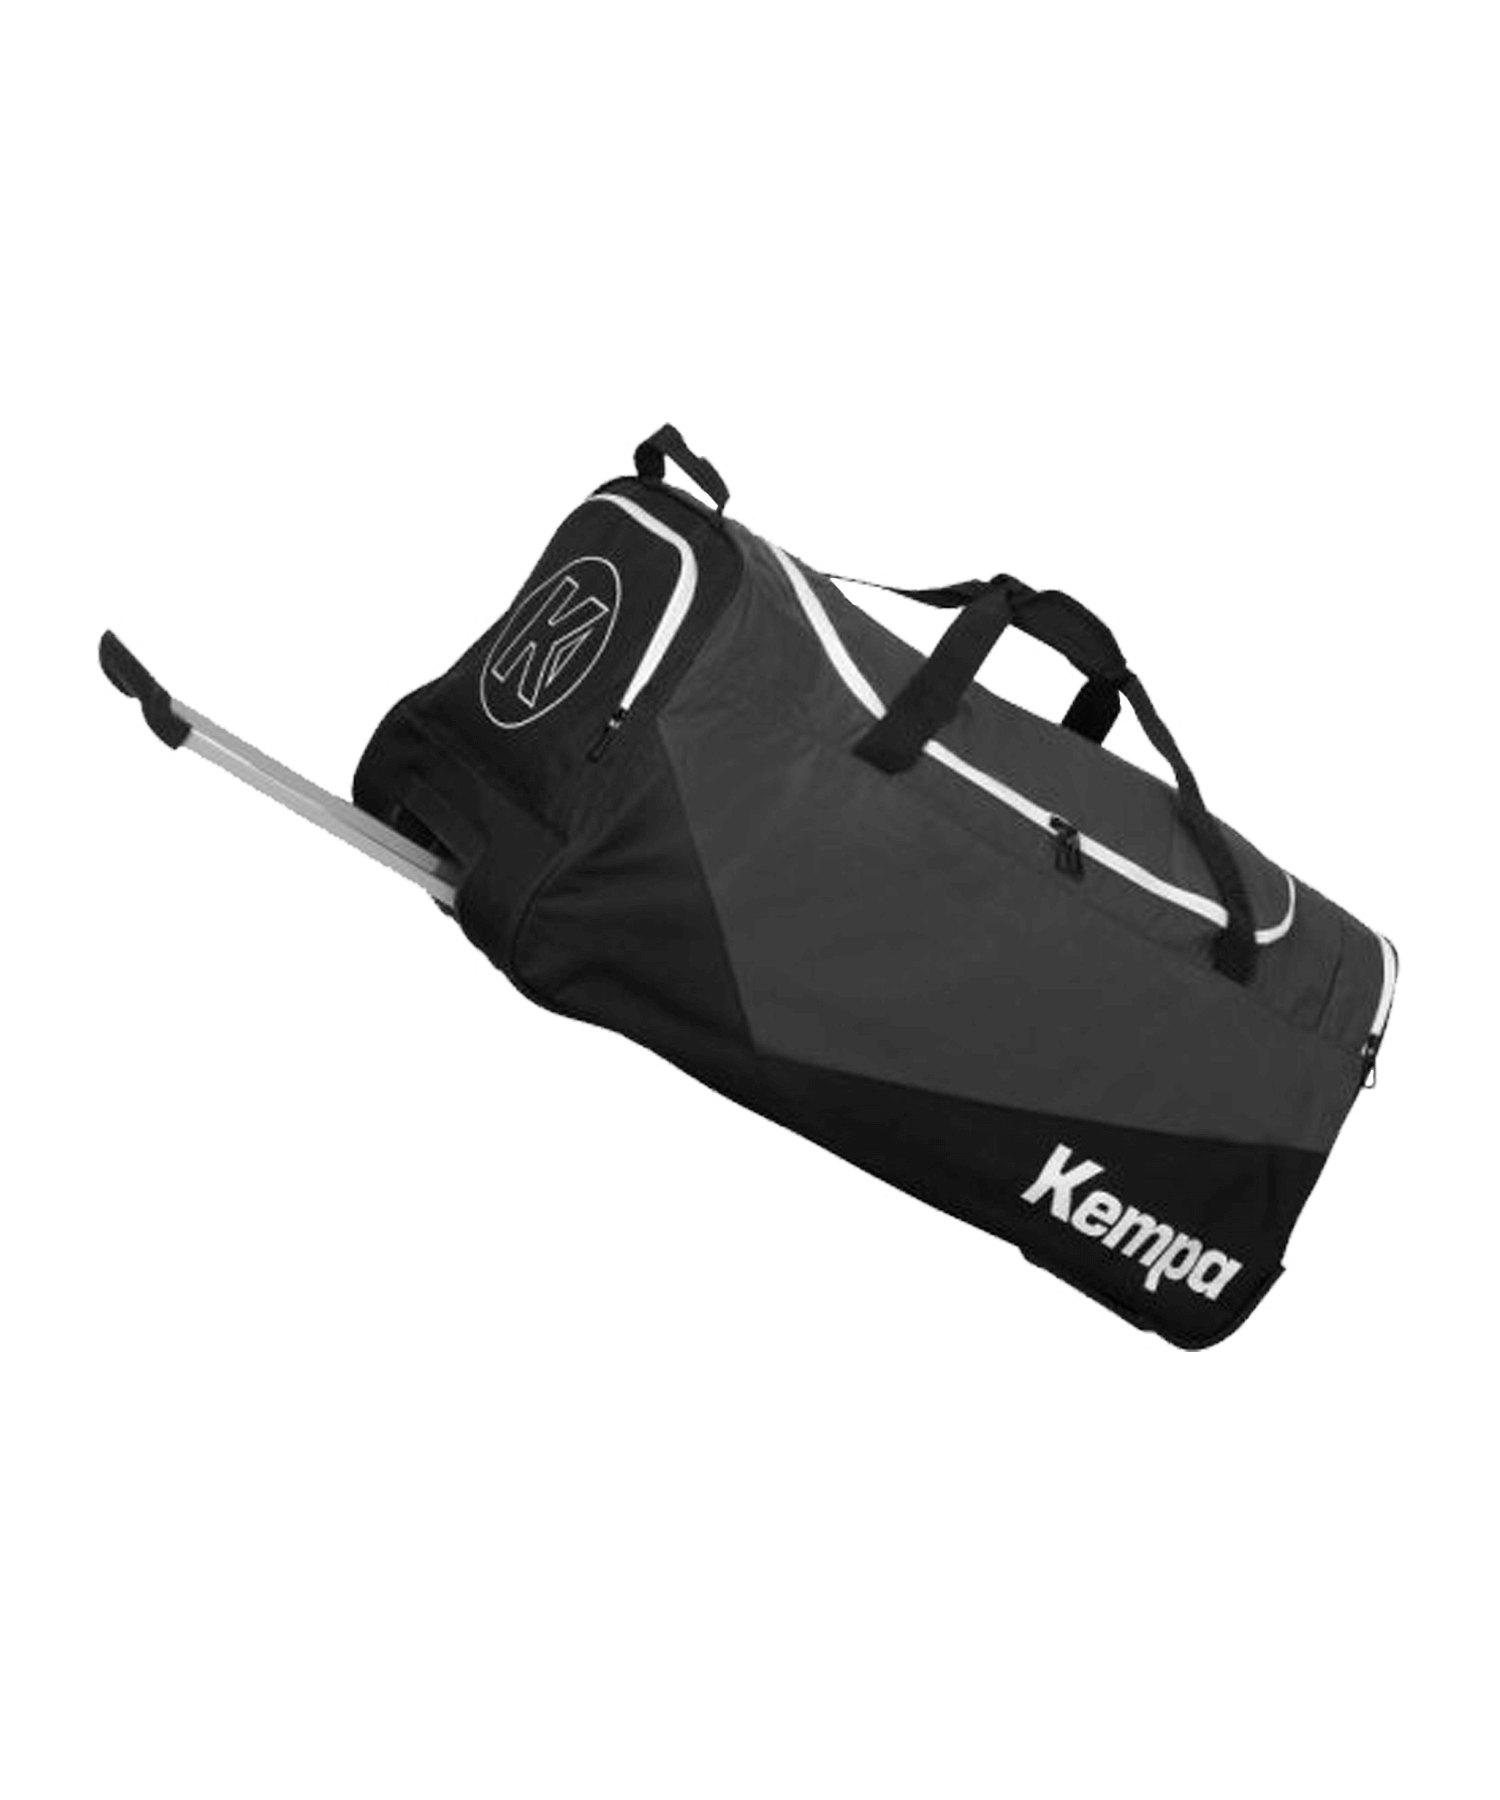 Kempa Trolley Bag Sporttasche Large Grau F01 - grau